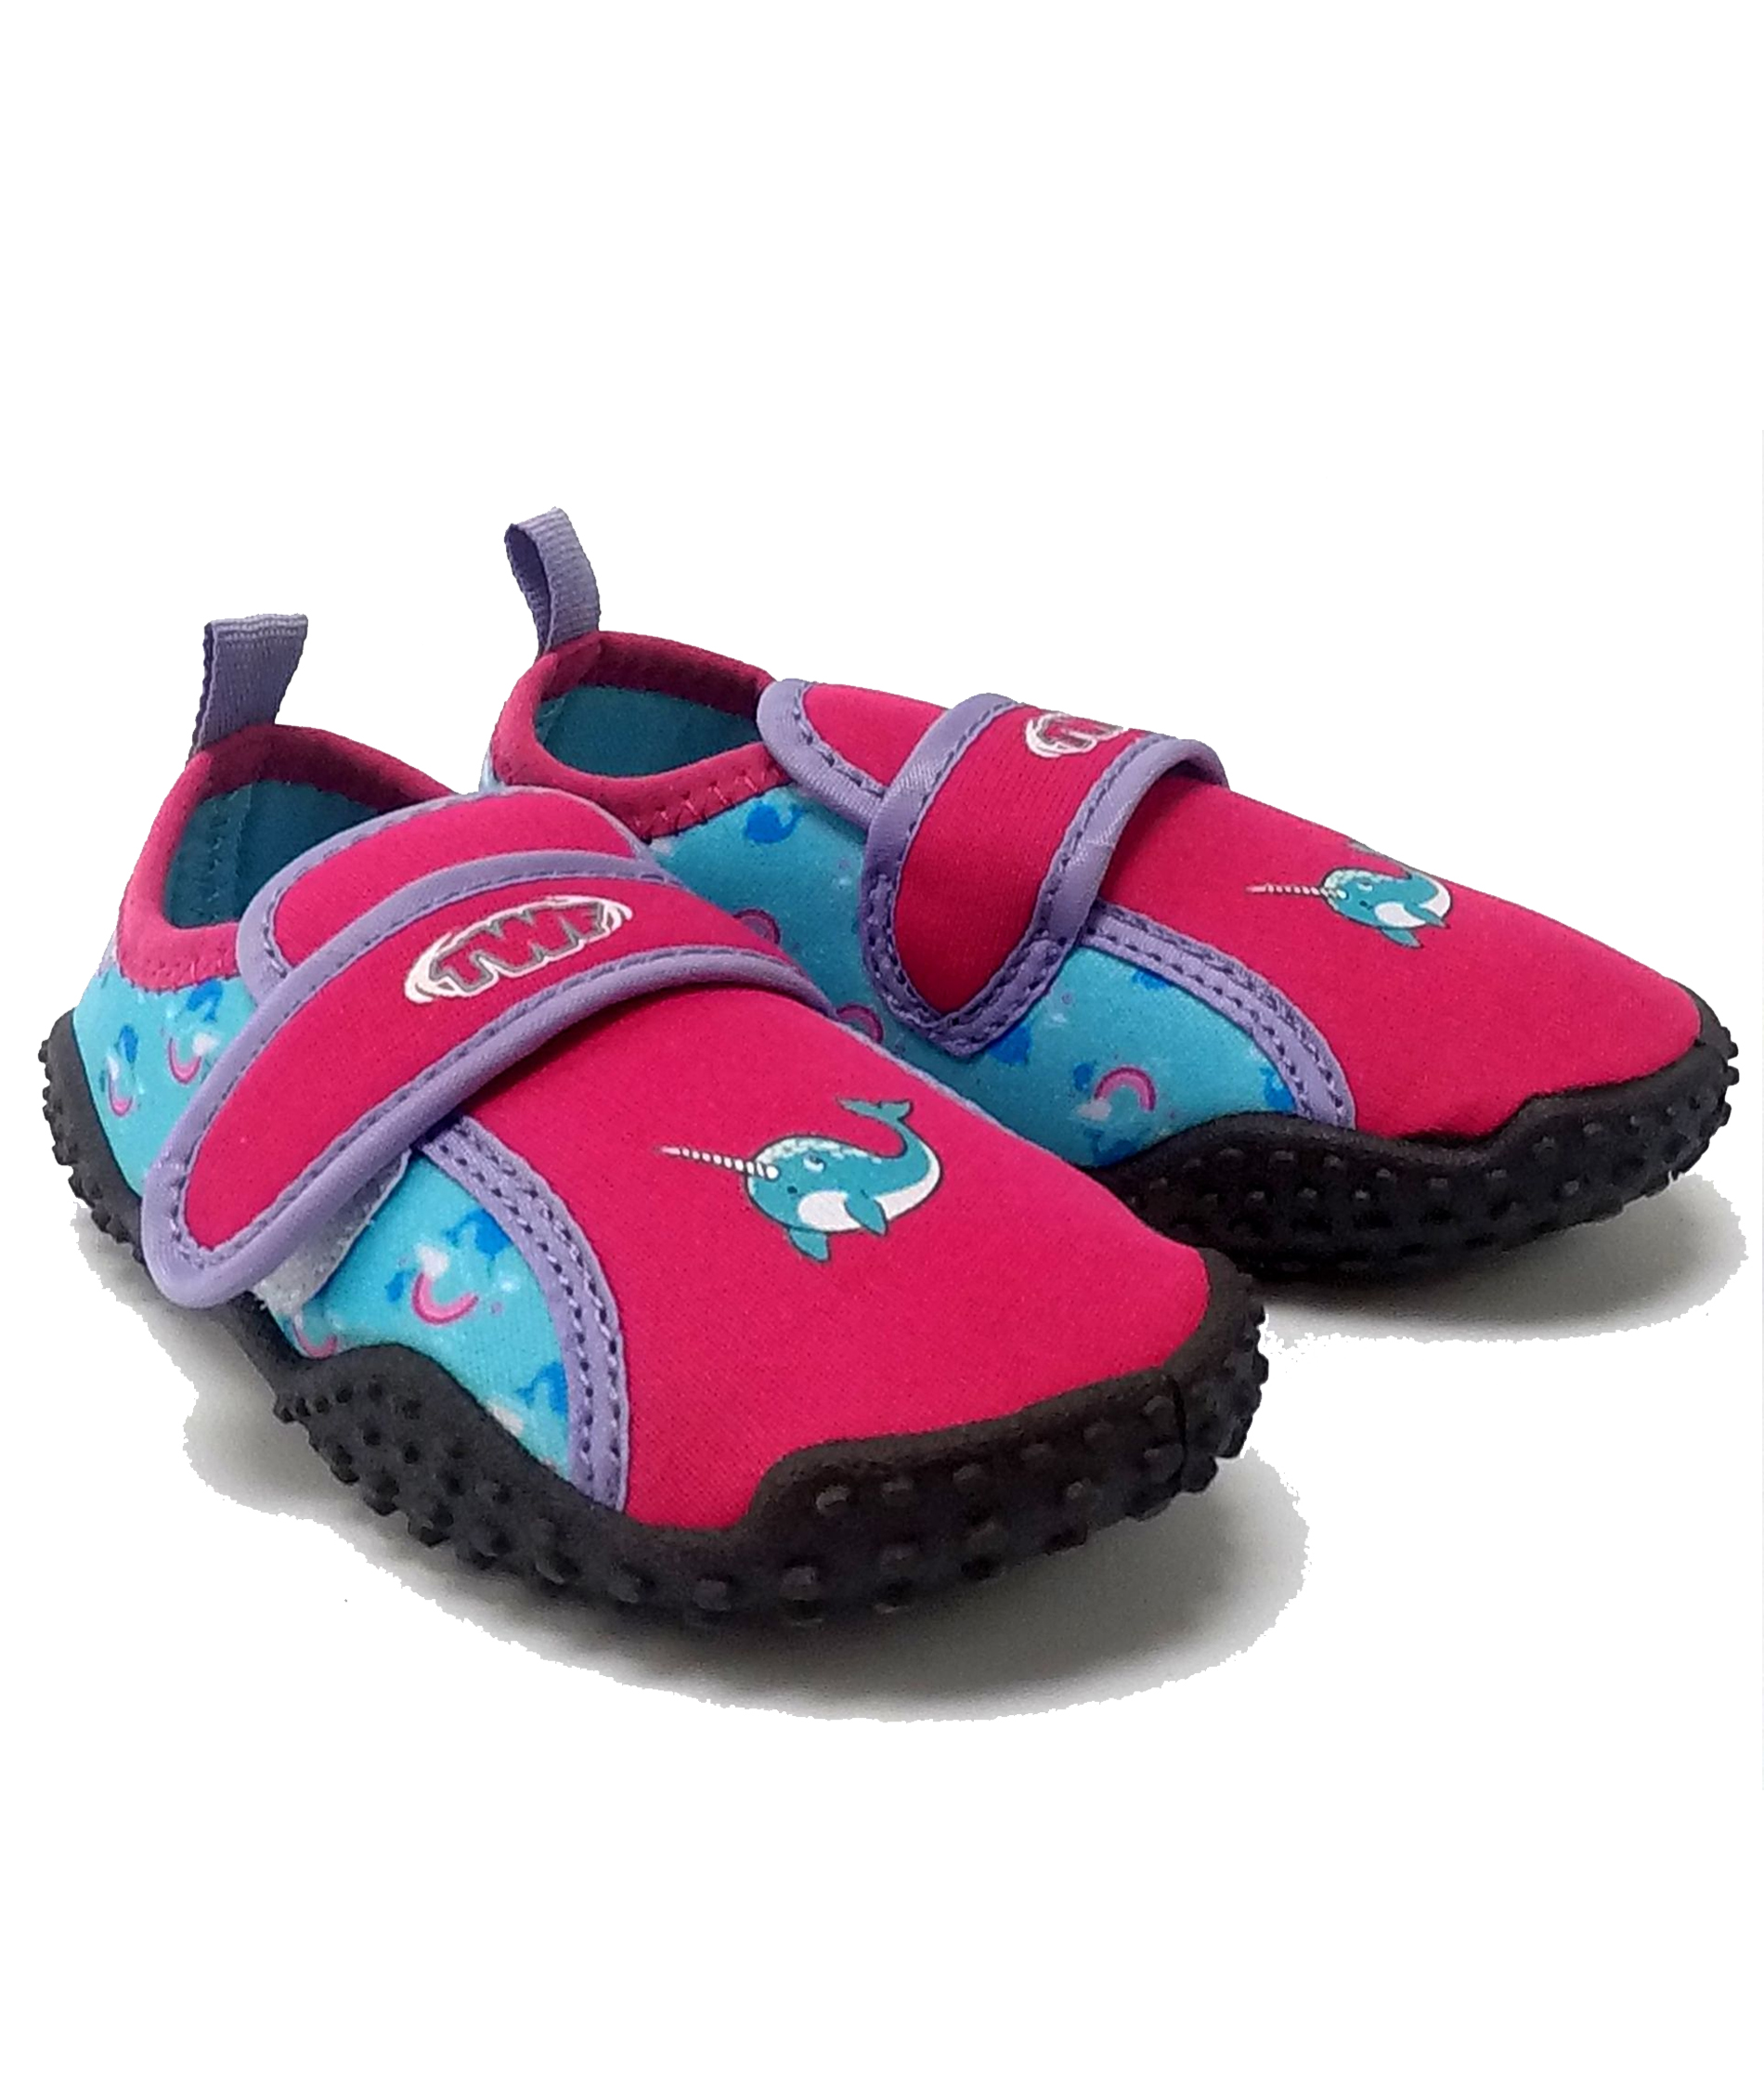 TWF Baby Wetshoes - Pink